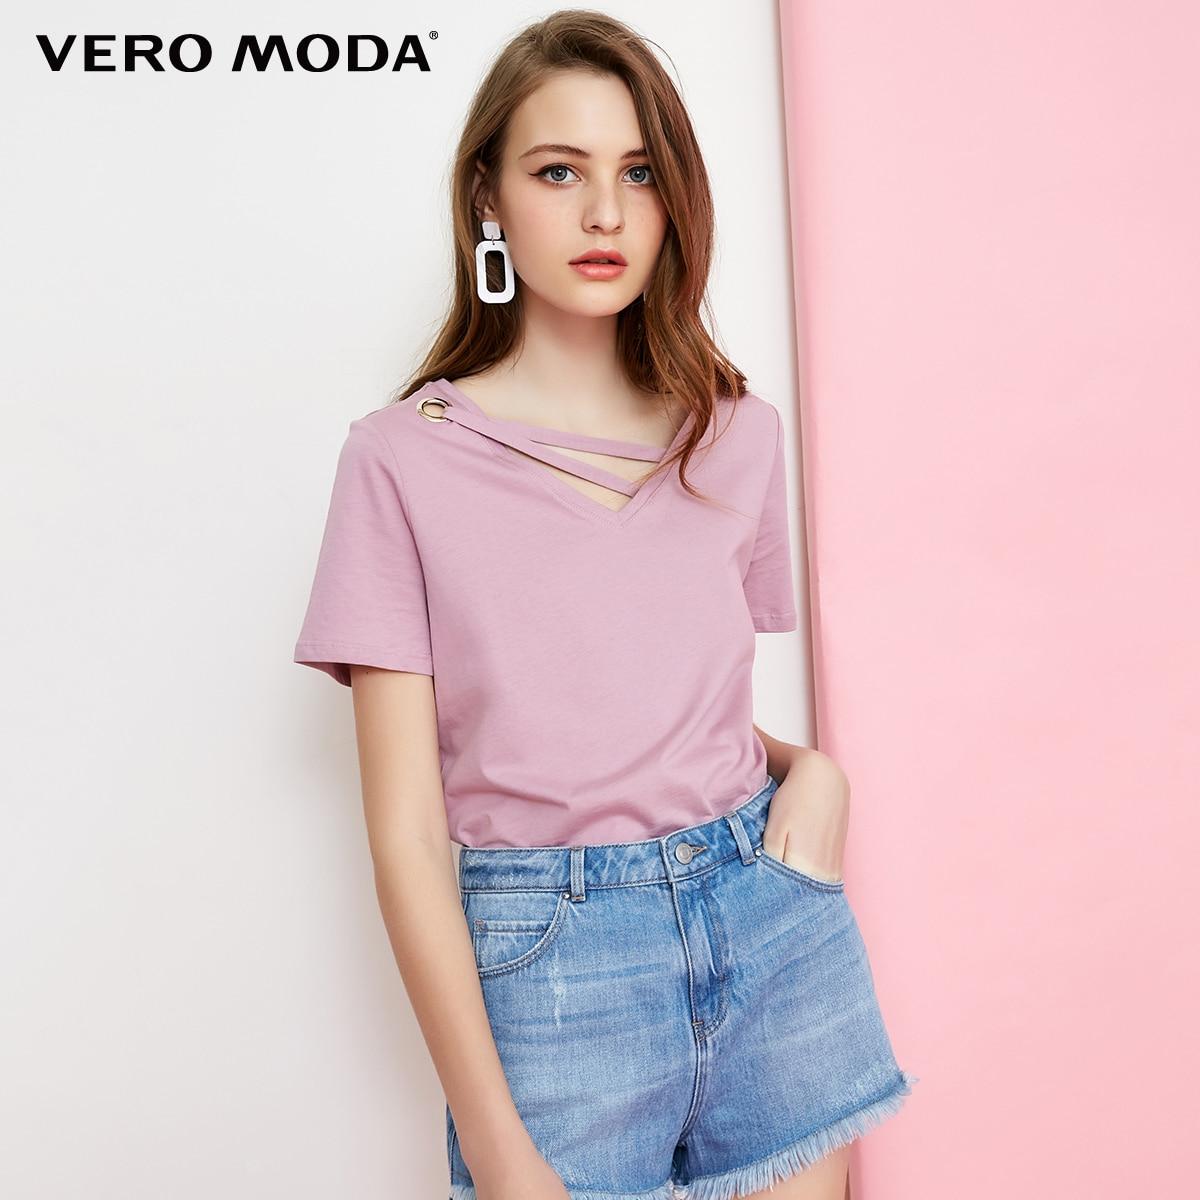 Decorative-Band T-Shirt Short-Sleeve Collar Vero Moda Casual Pure-Color 100%Cotton 318101523